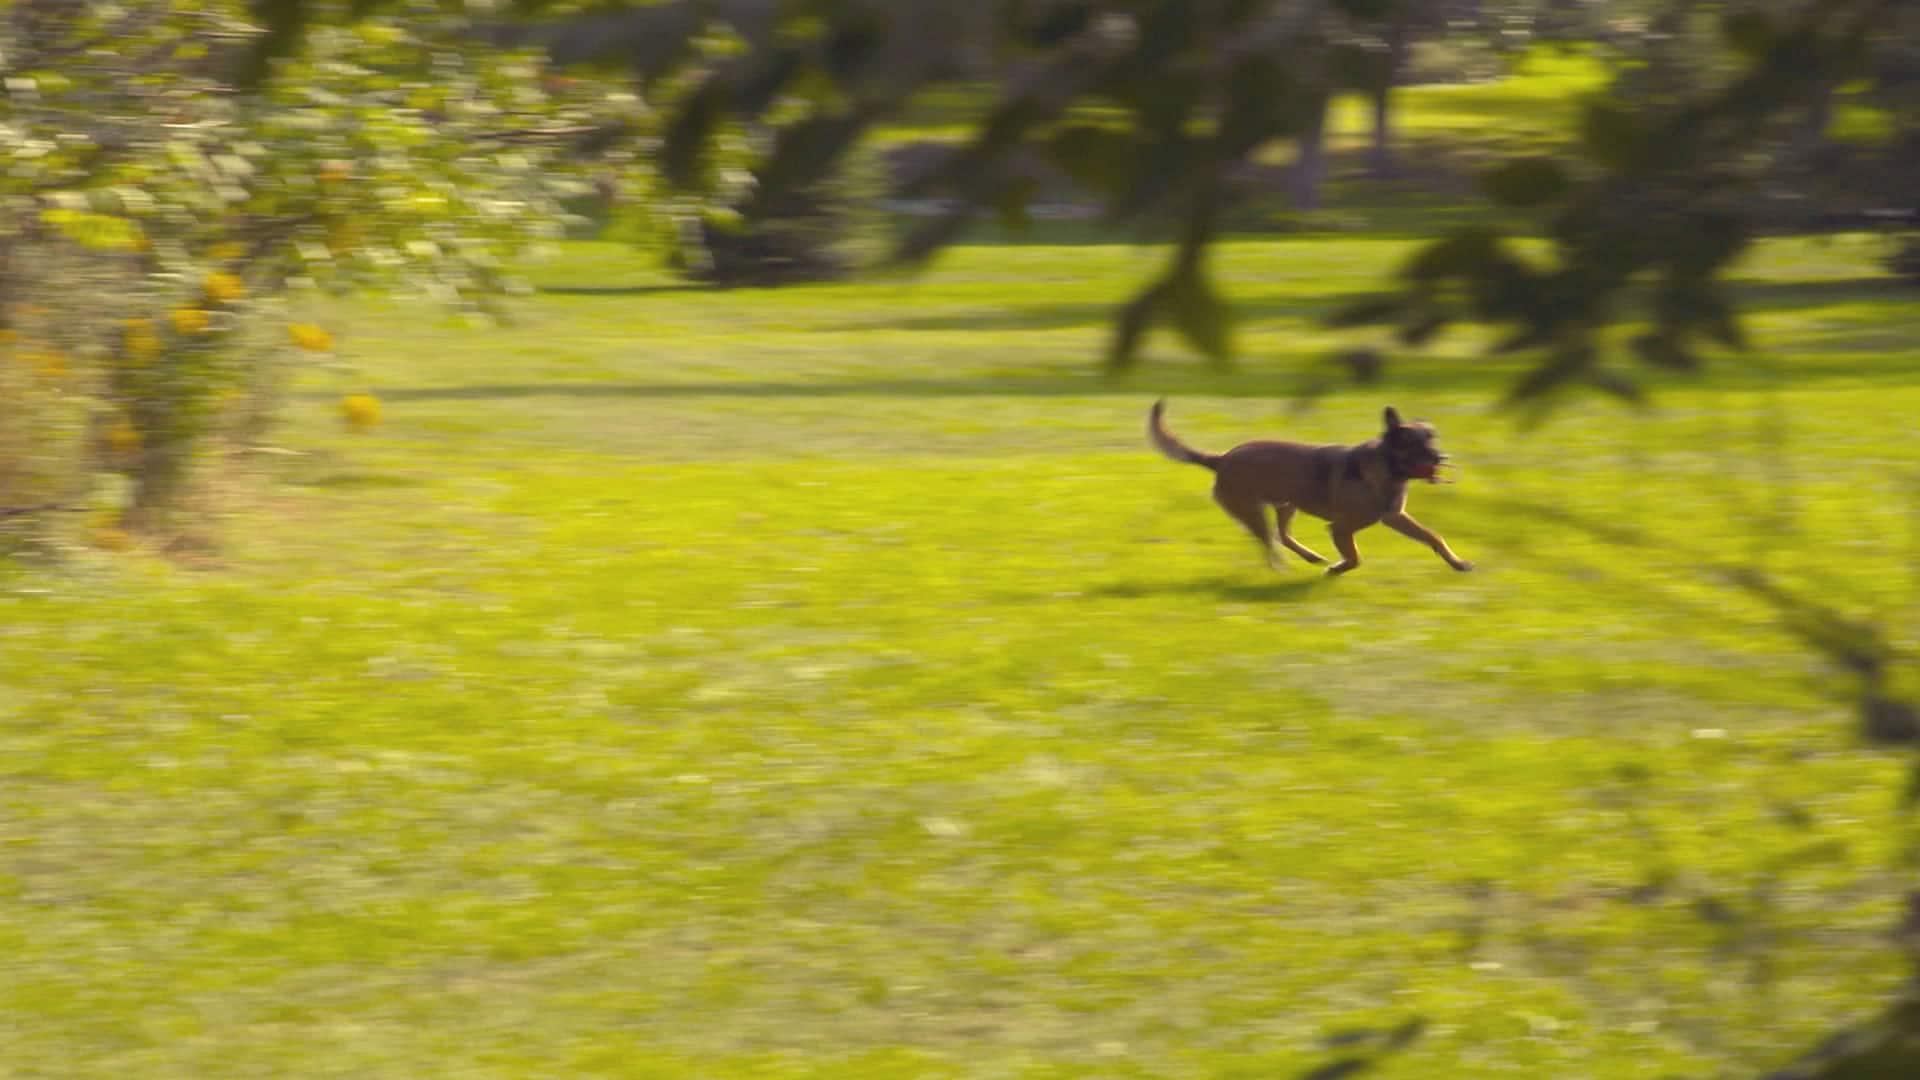 Niagara's Canine cops